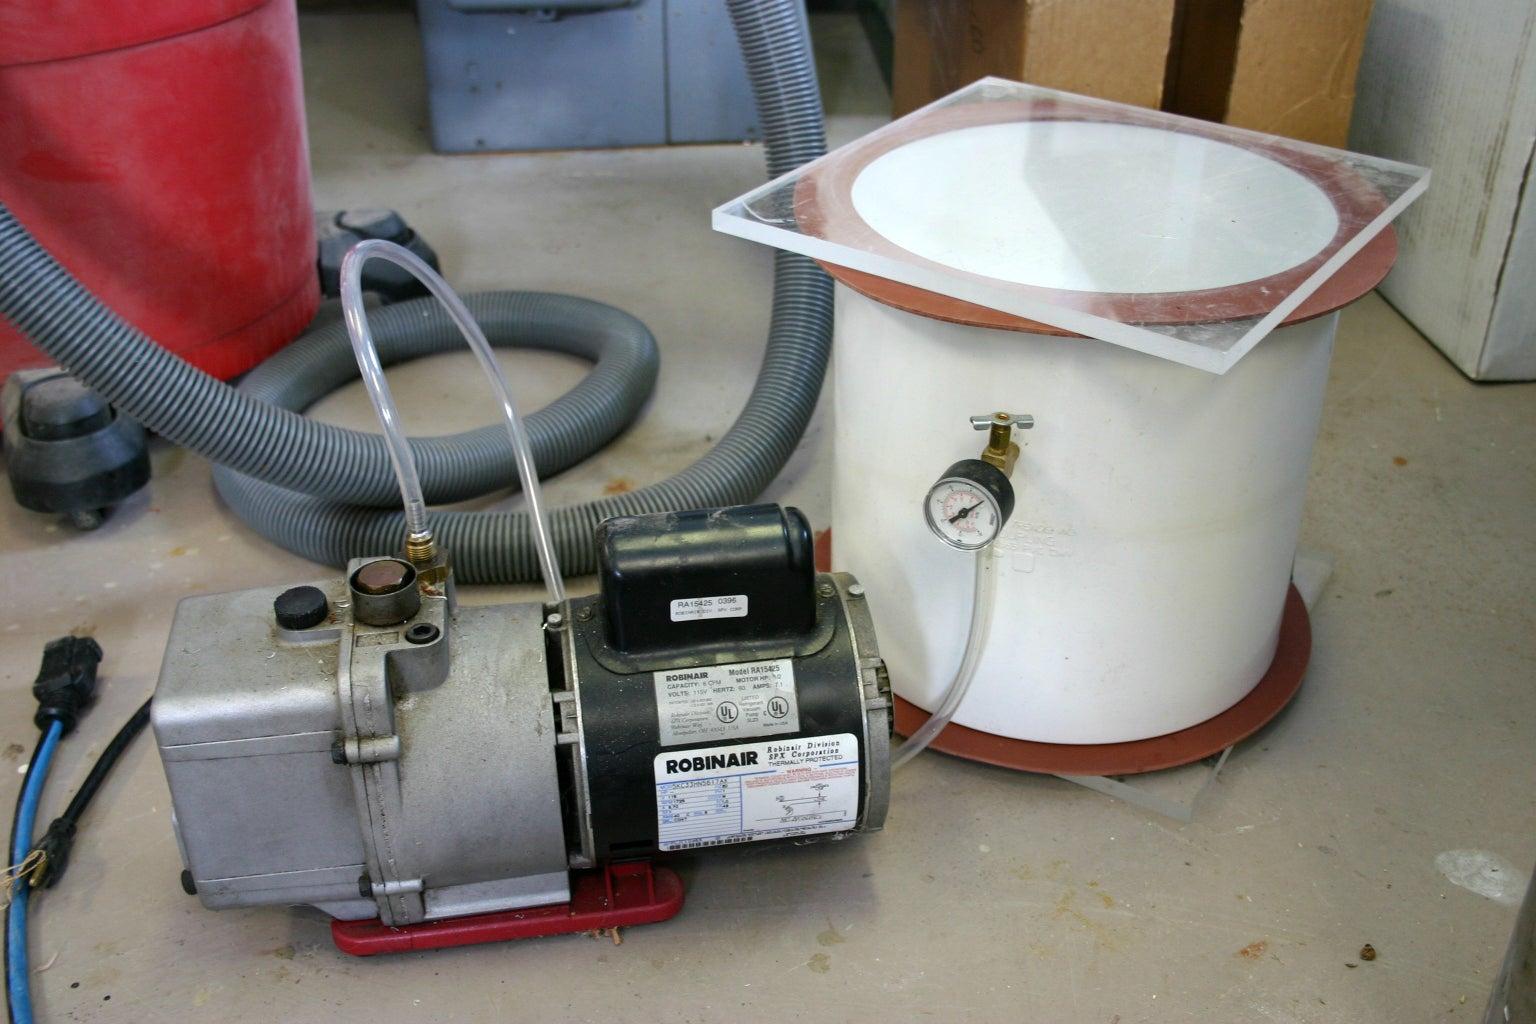 Step 3: Prepare the Silicone for Pouring